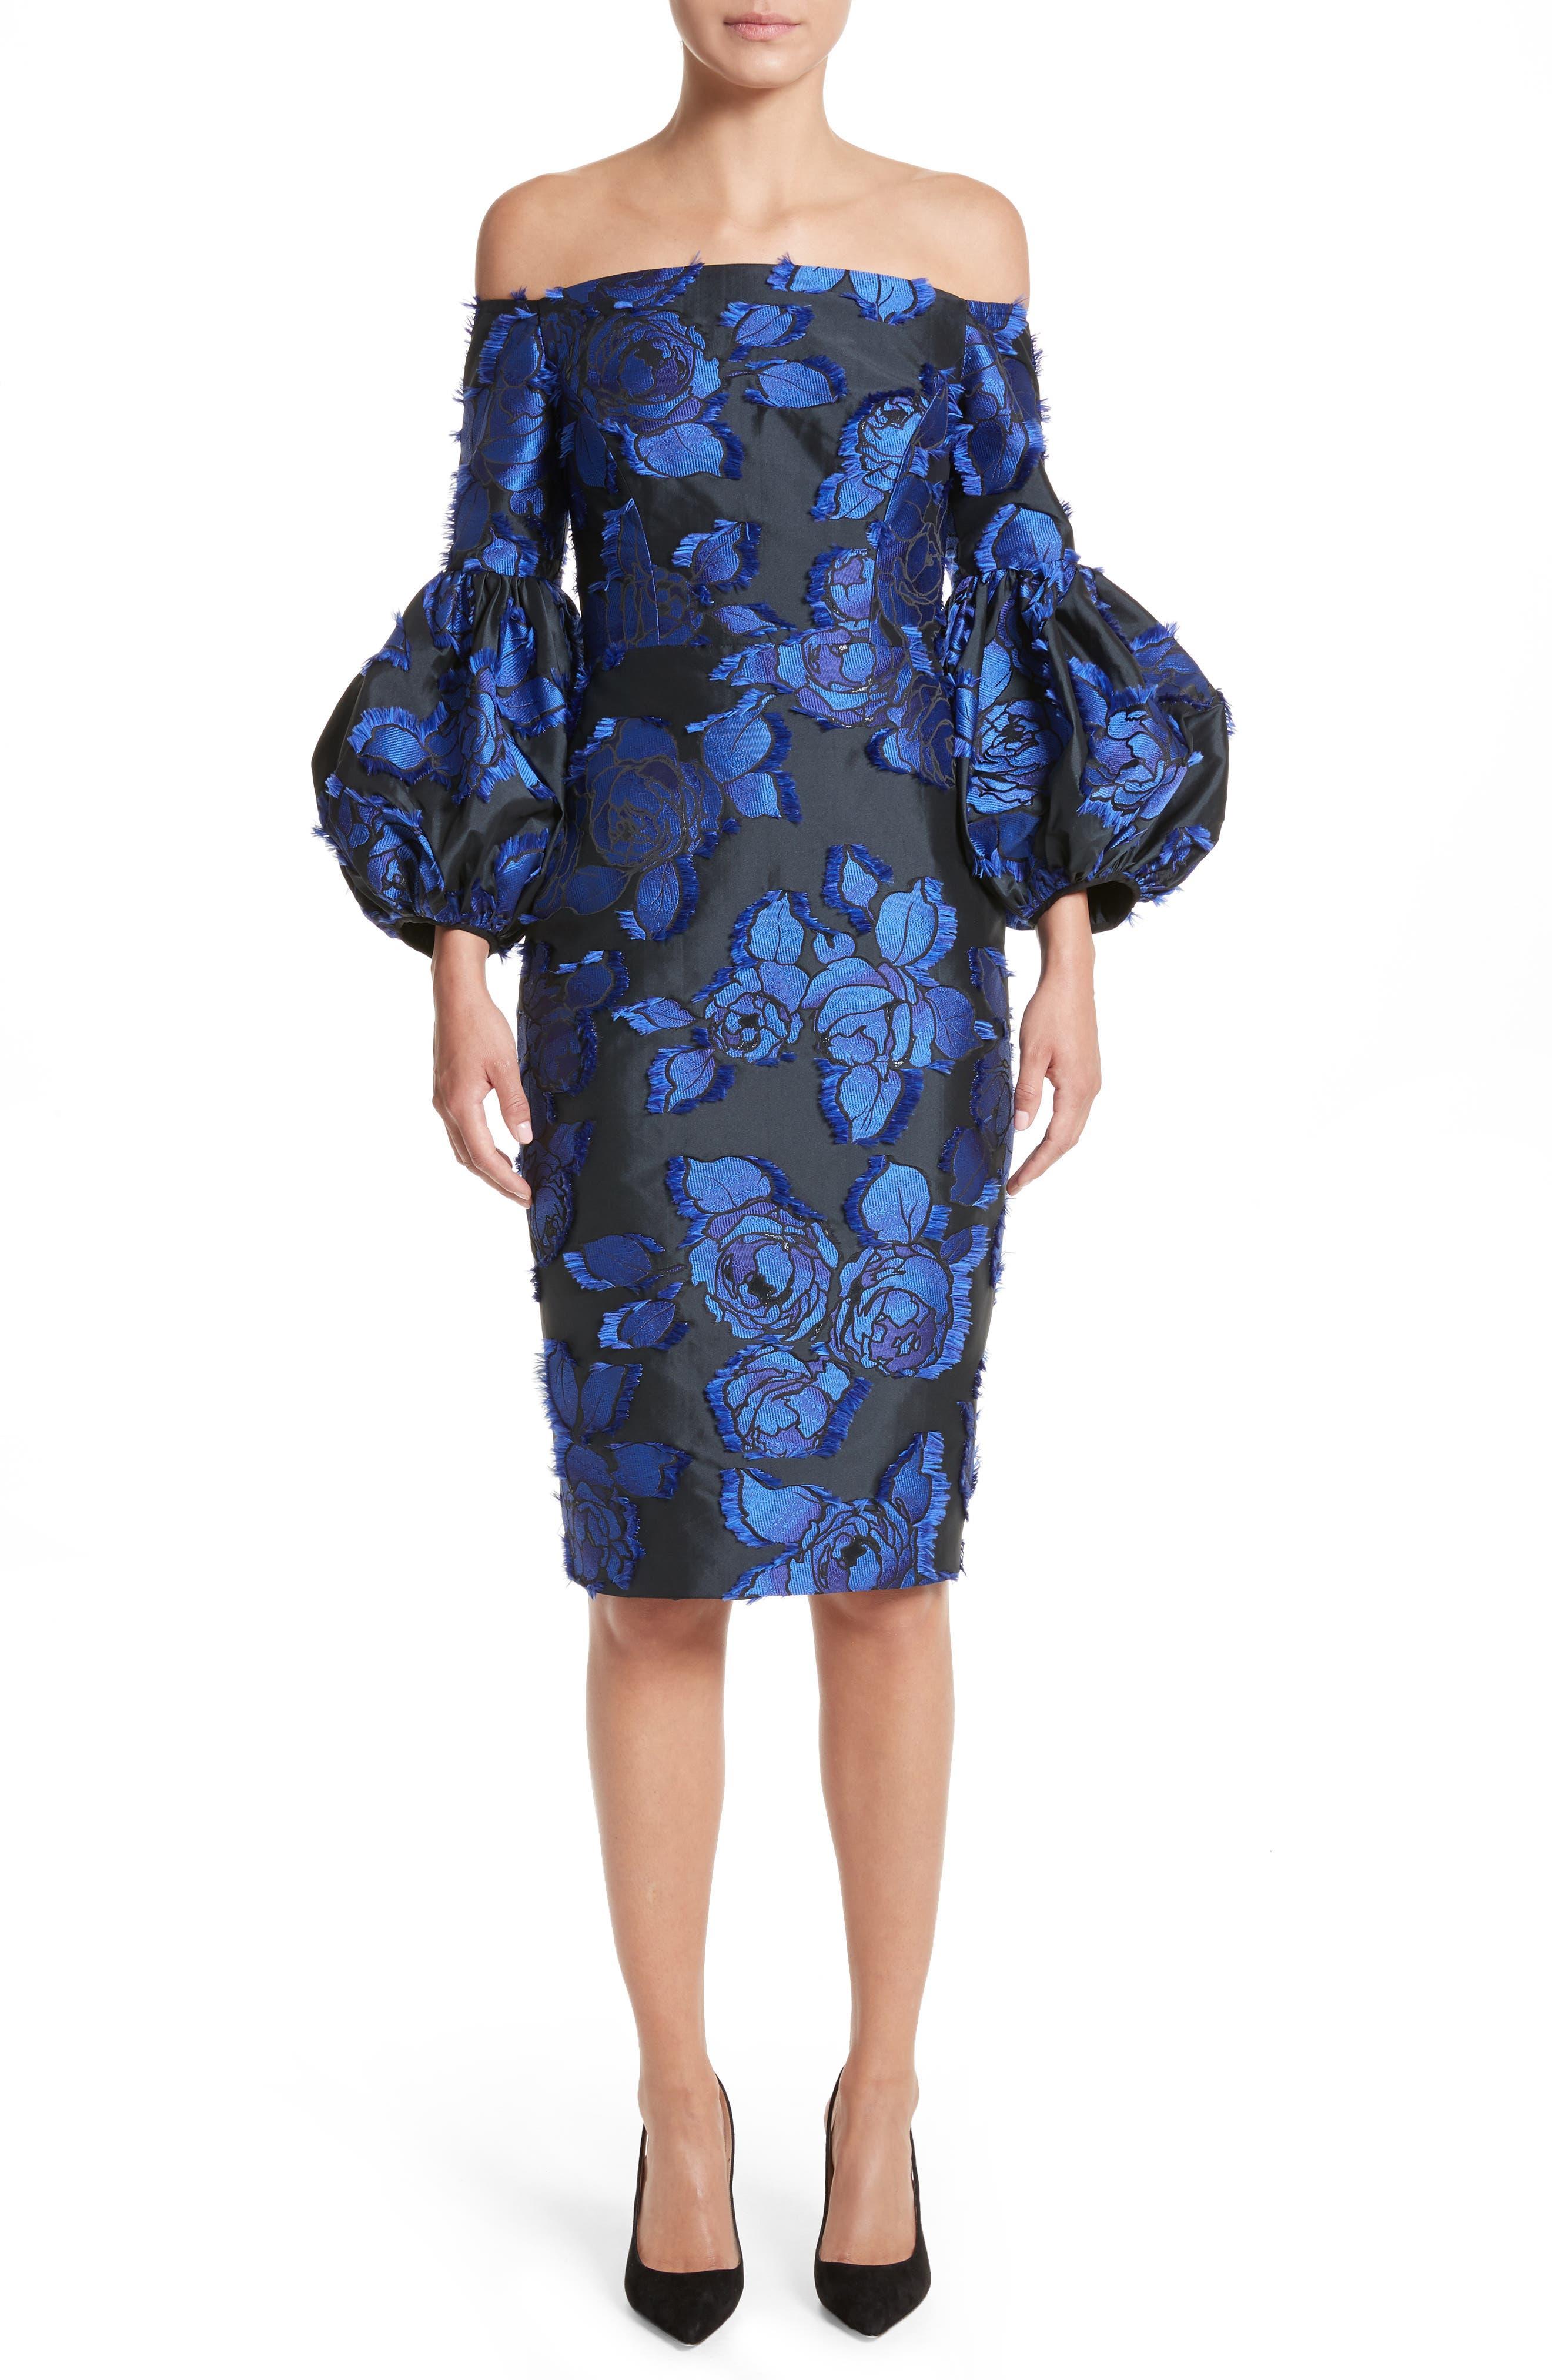 Fring Brocade Puff Sleeve Dress,                             Main thumbnail 1, color,                             001